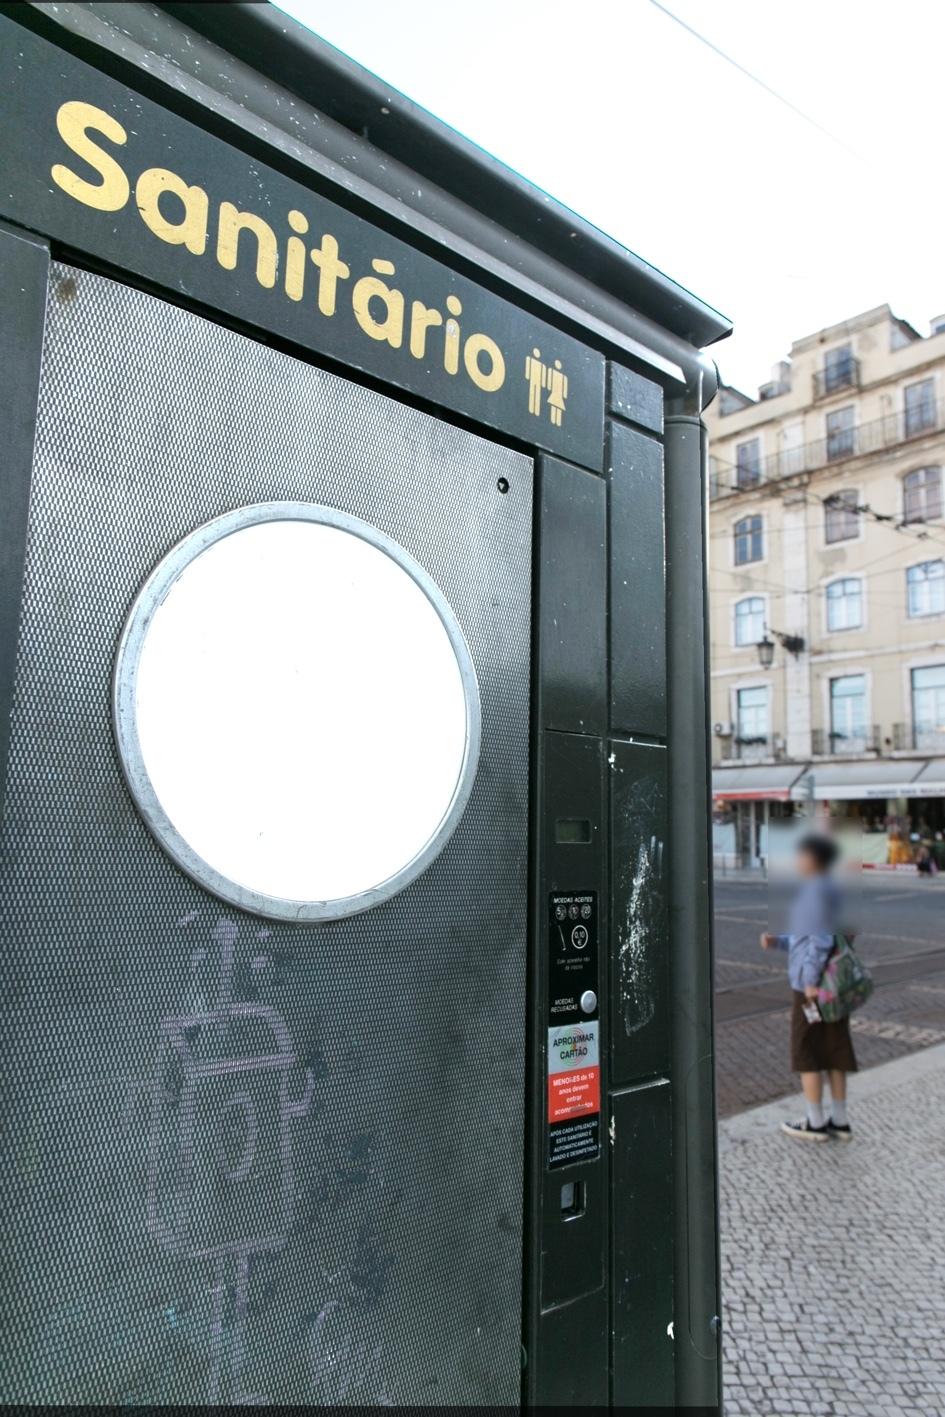 201906-Lisbon-0138.jpg